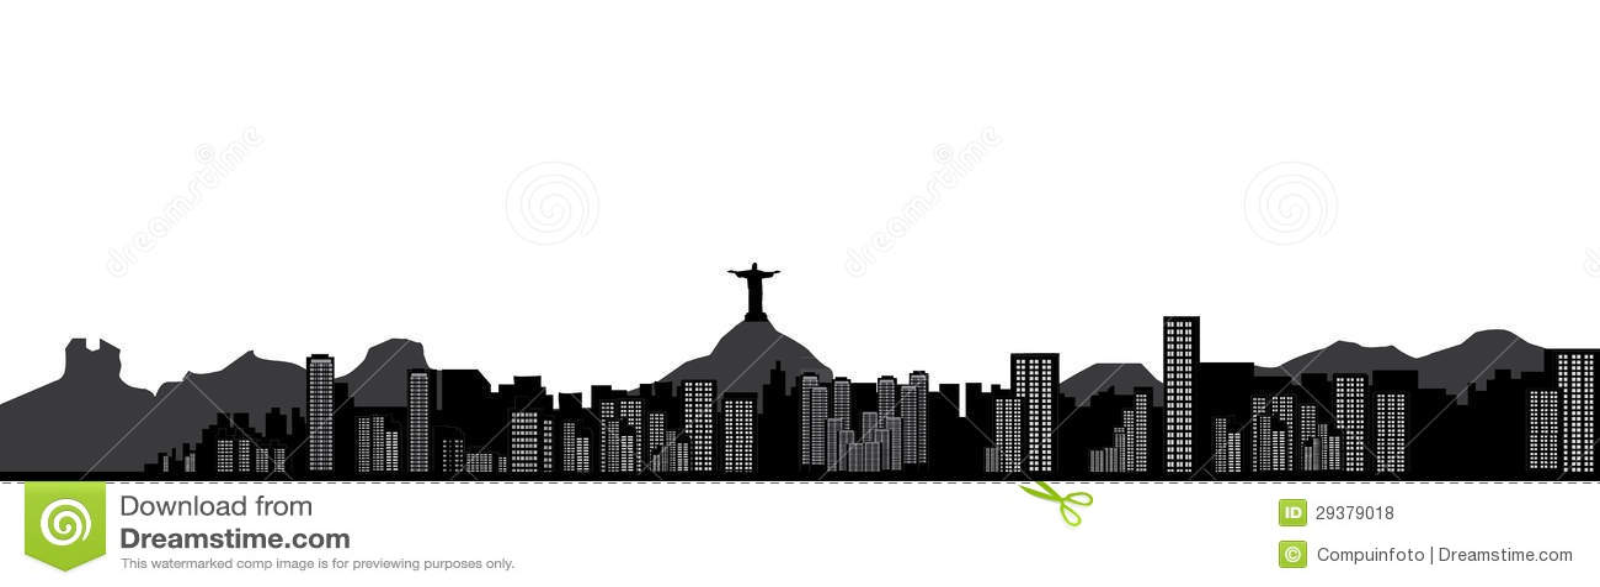 Rio De Janeiro Skyline Royalty Free Stock Photos - Image: 29379018